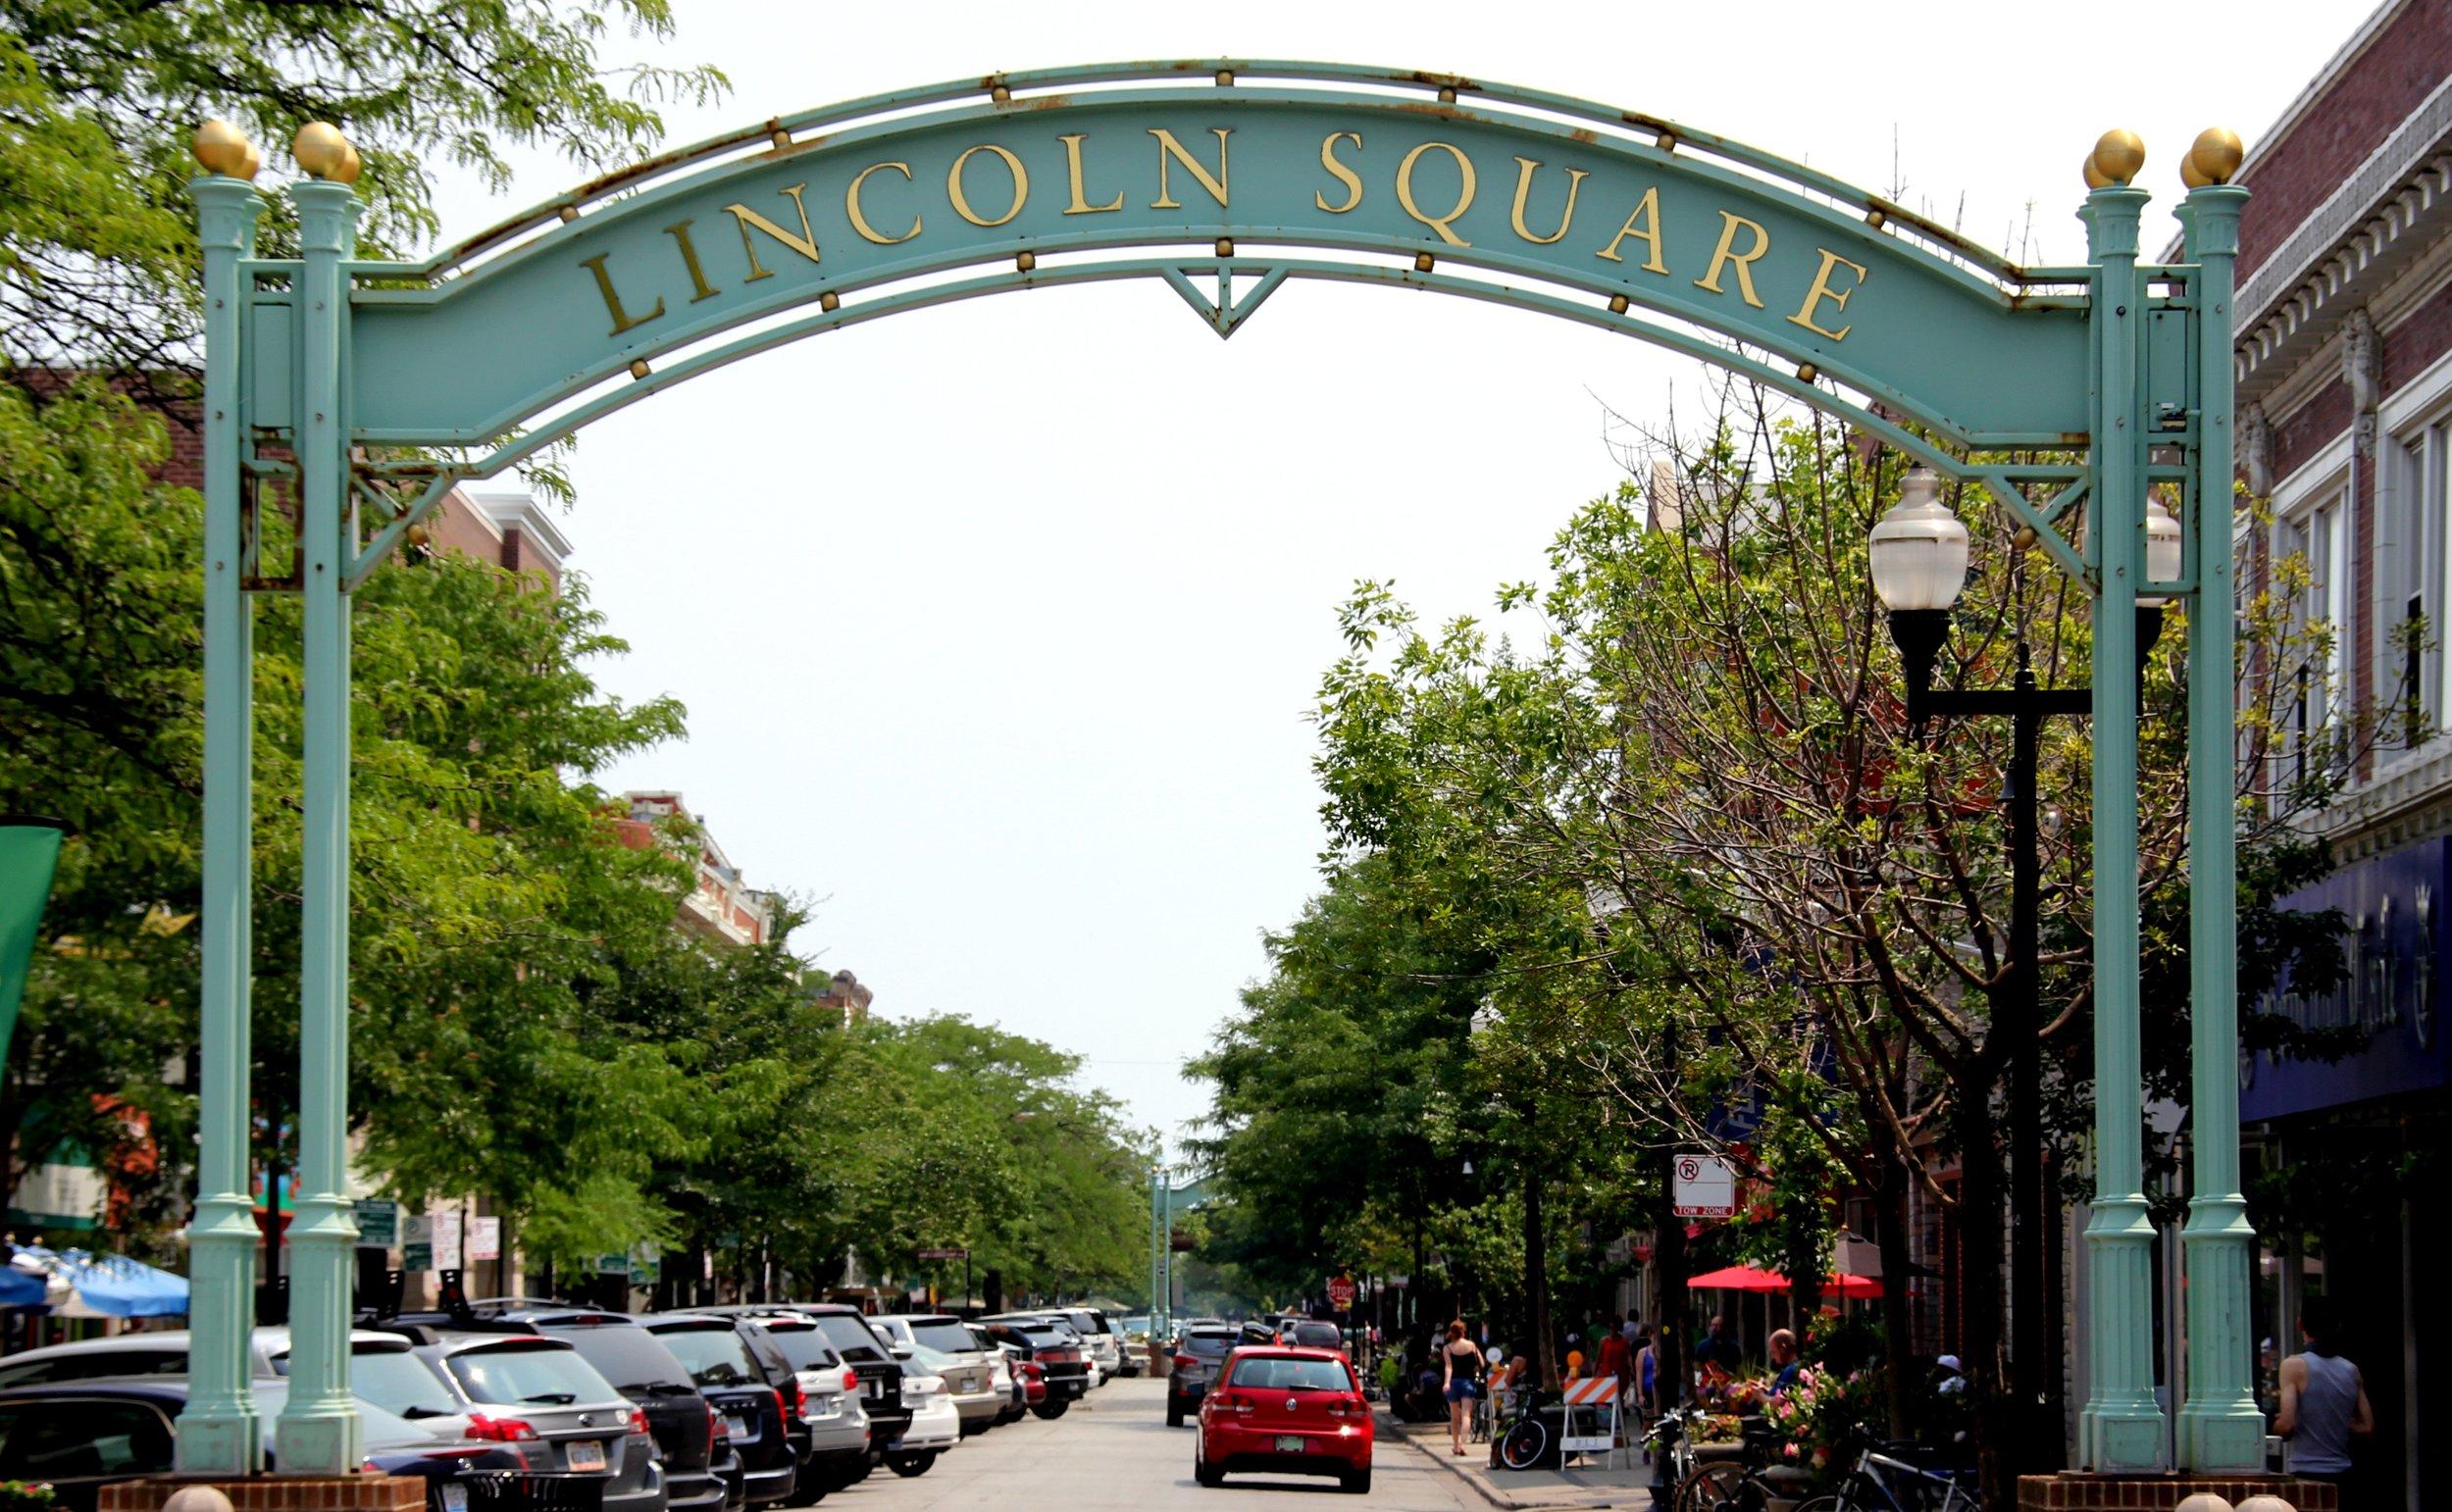 Lincoln Square - Copy.JPG